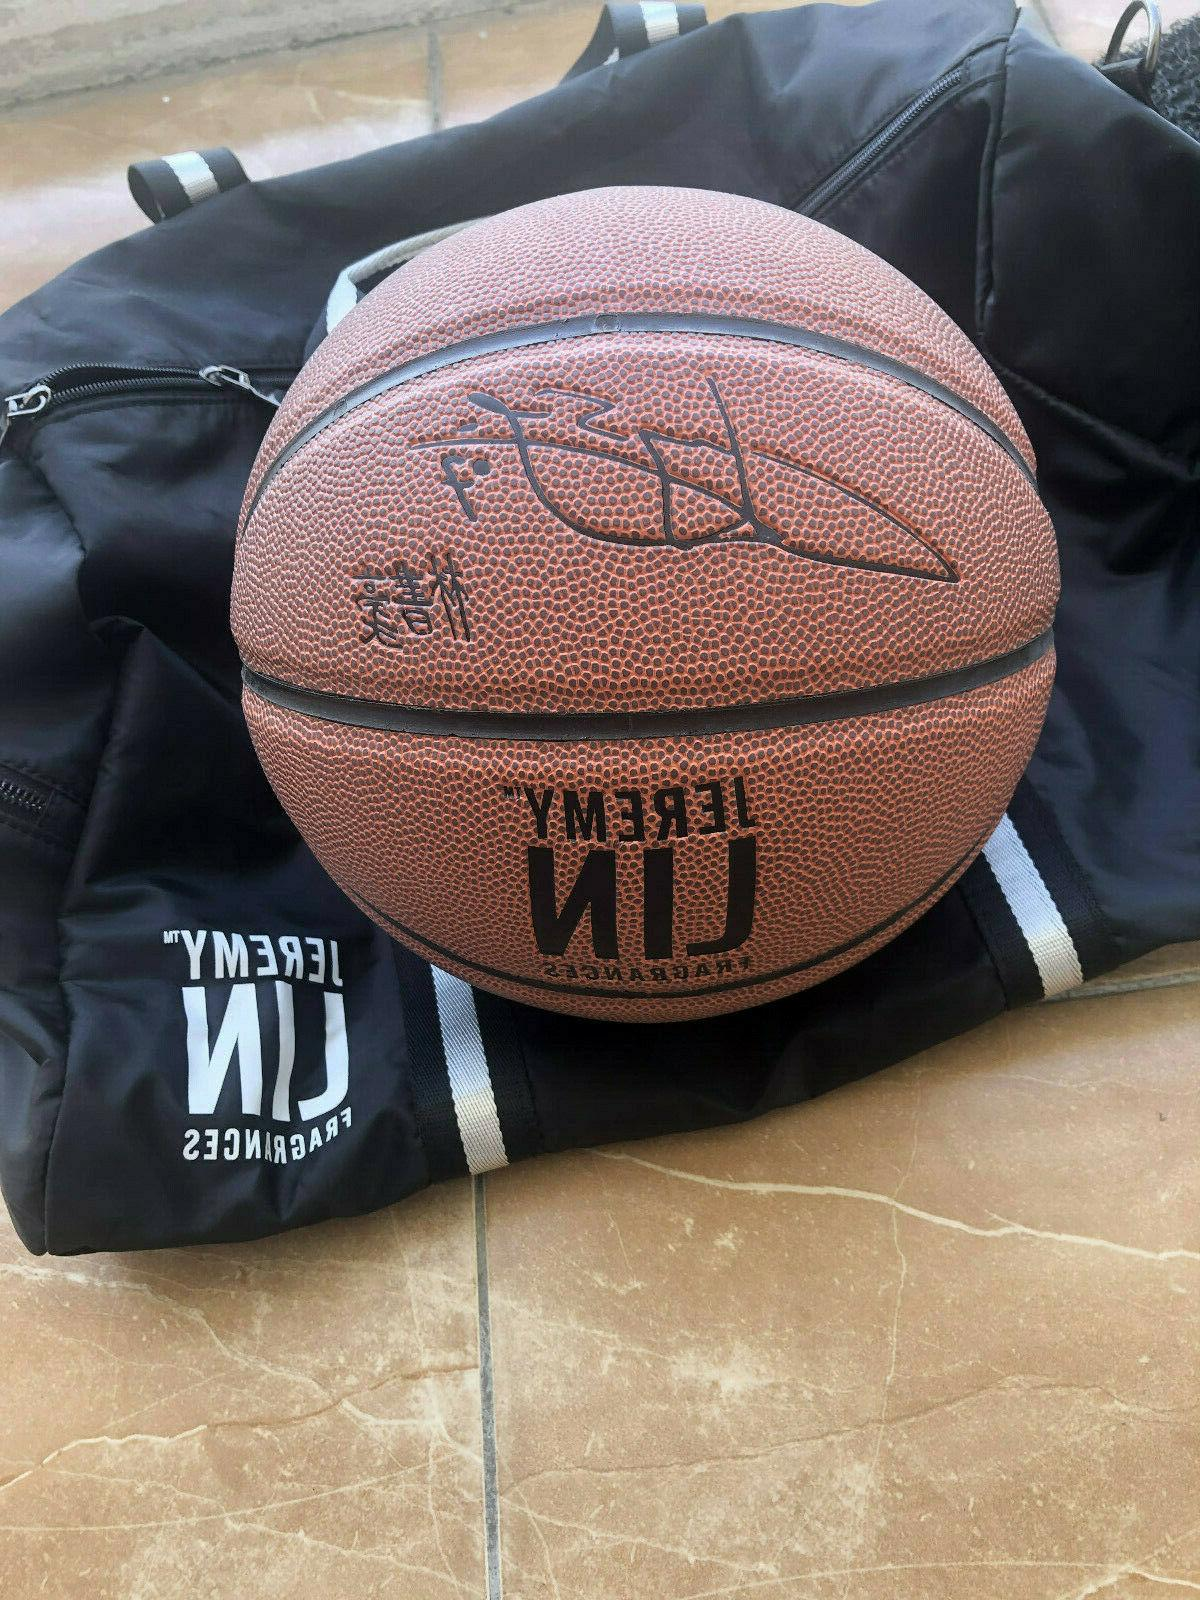 jeremy lin limited edition basketball duffel bag